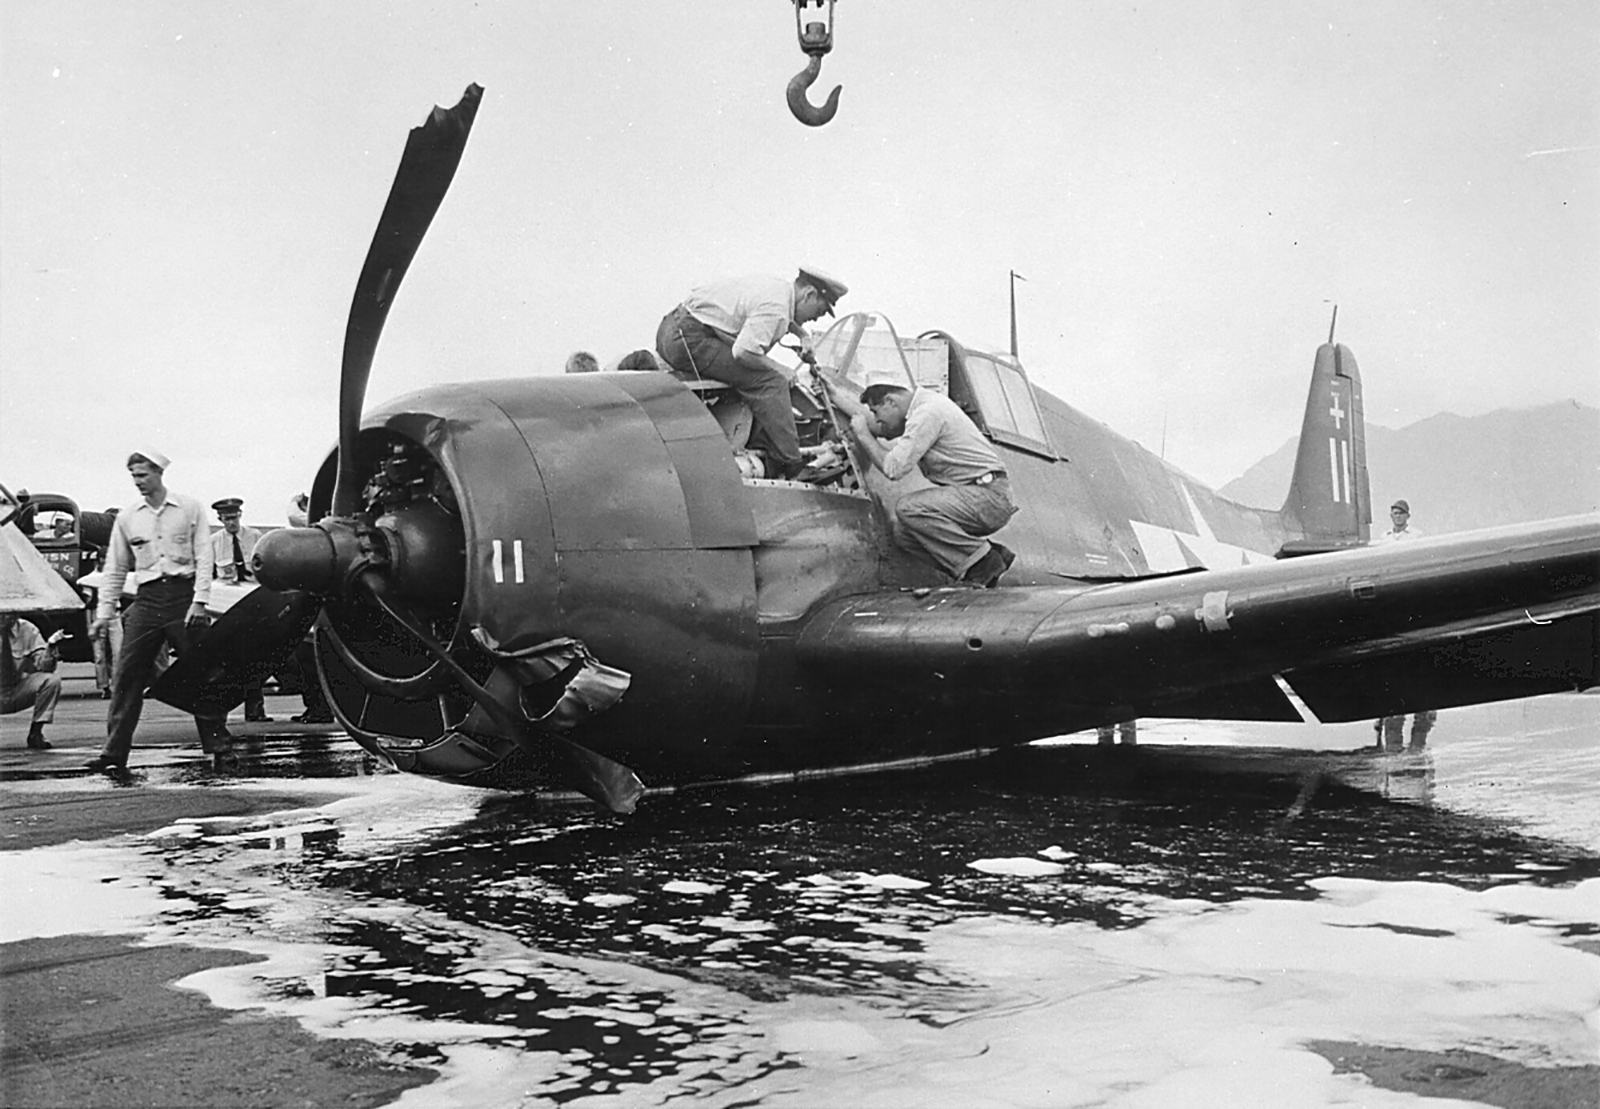 Grumman F6F 3 Hellcat VF 18 White 11 belly landed 01